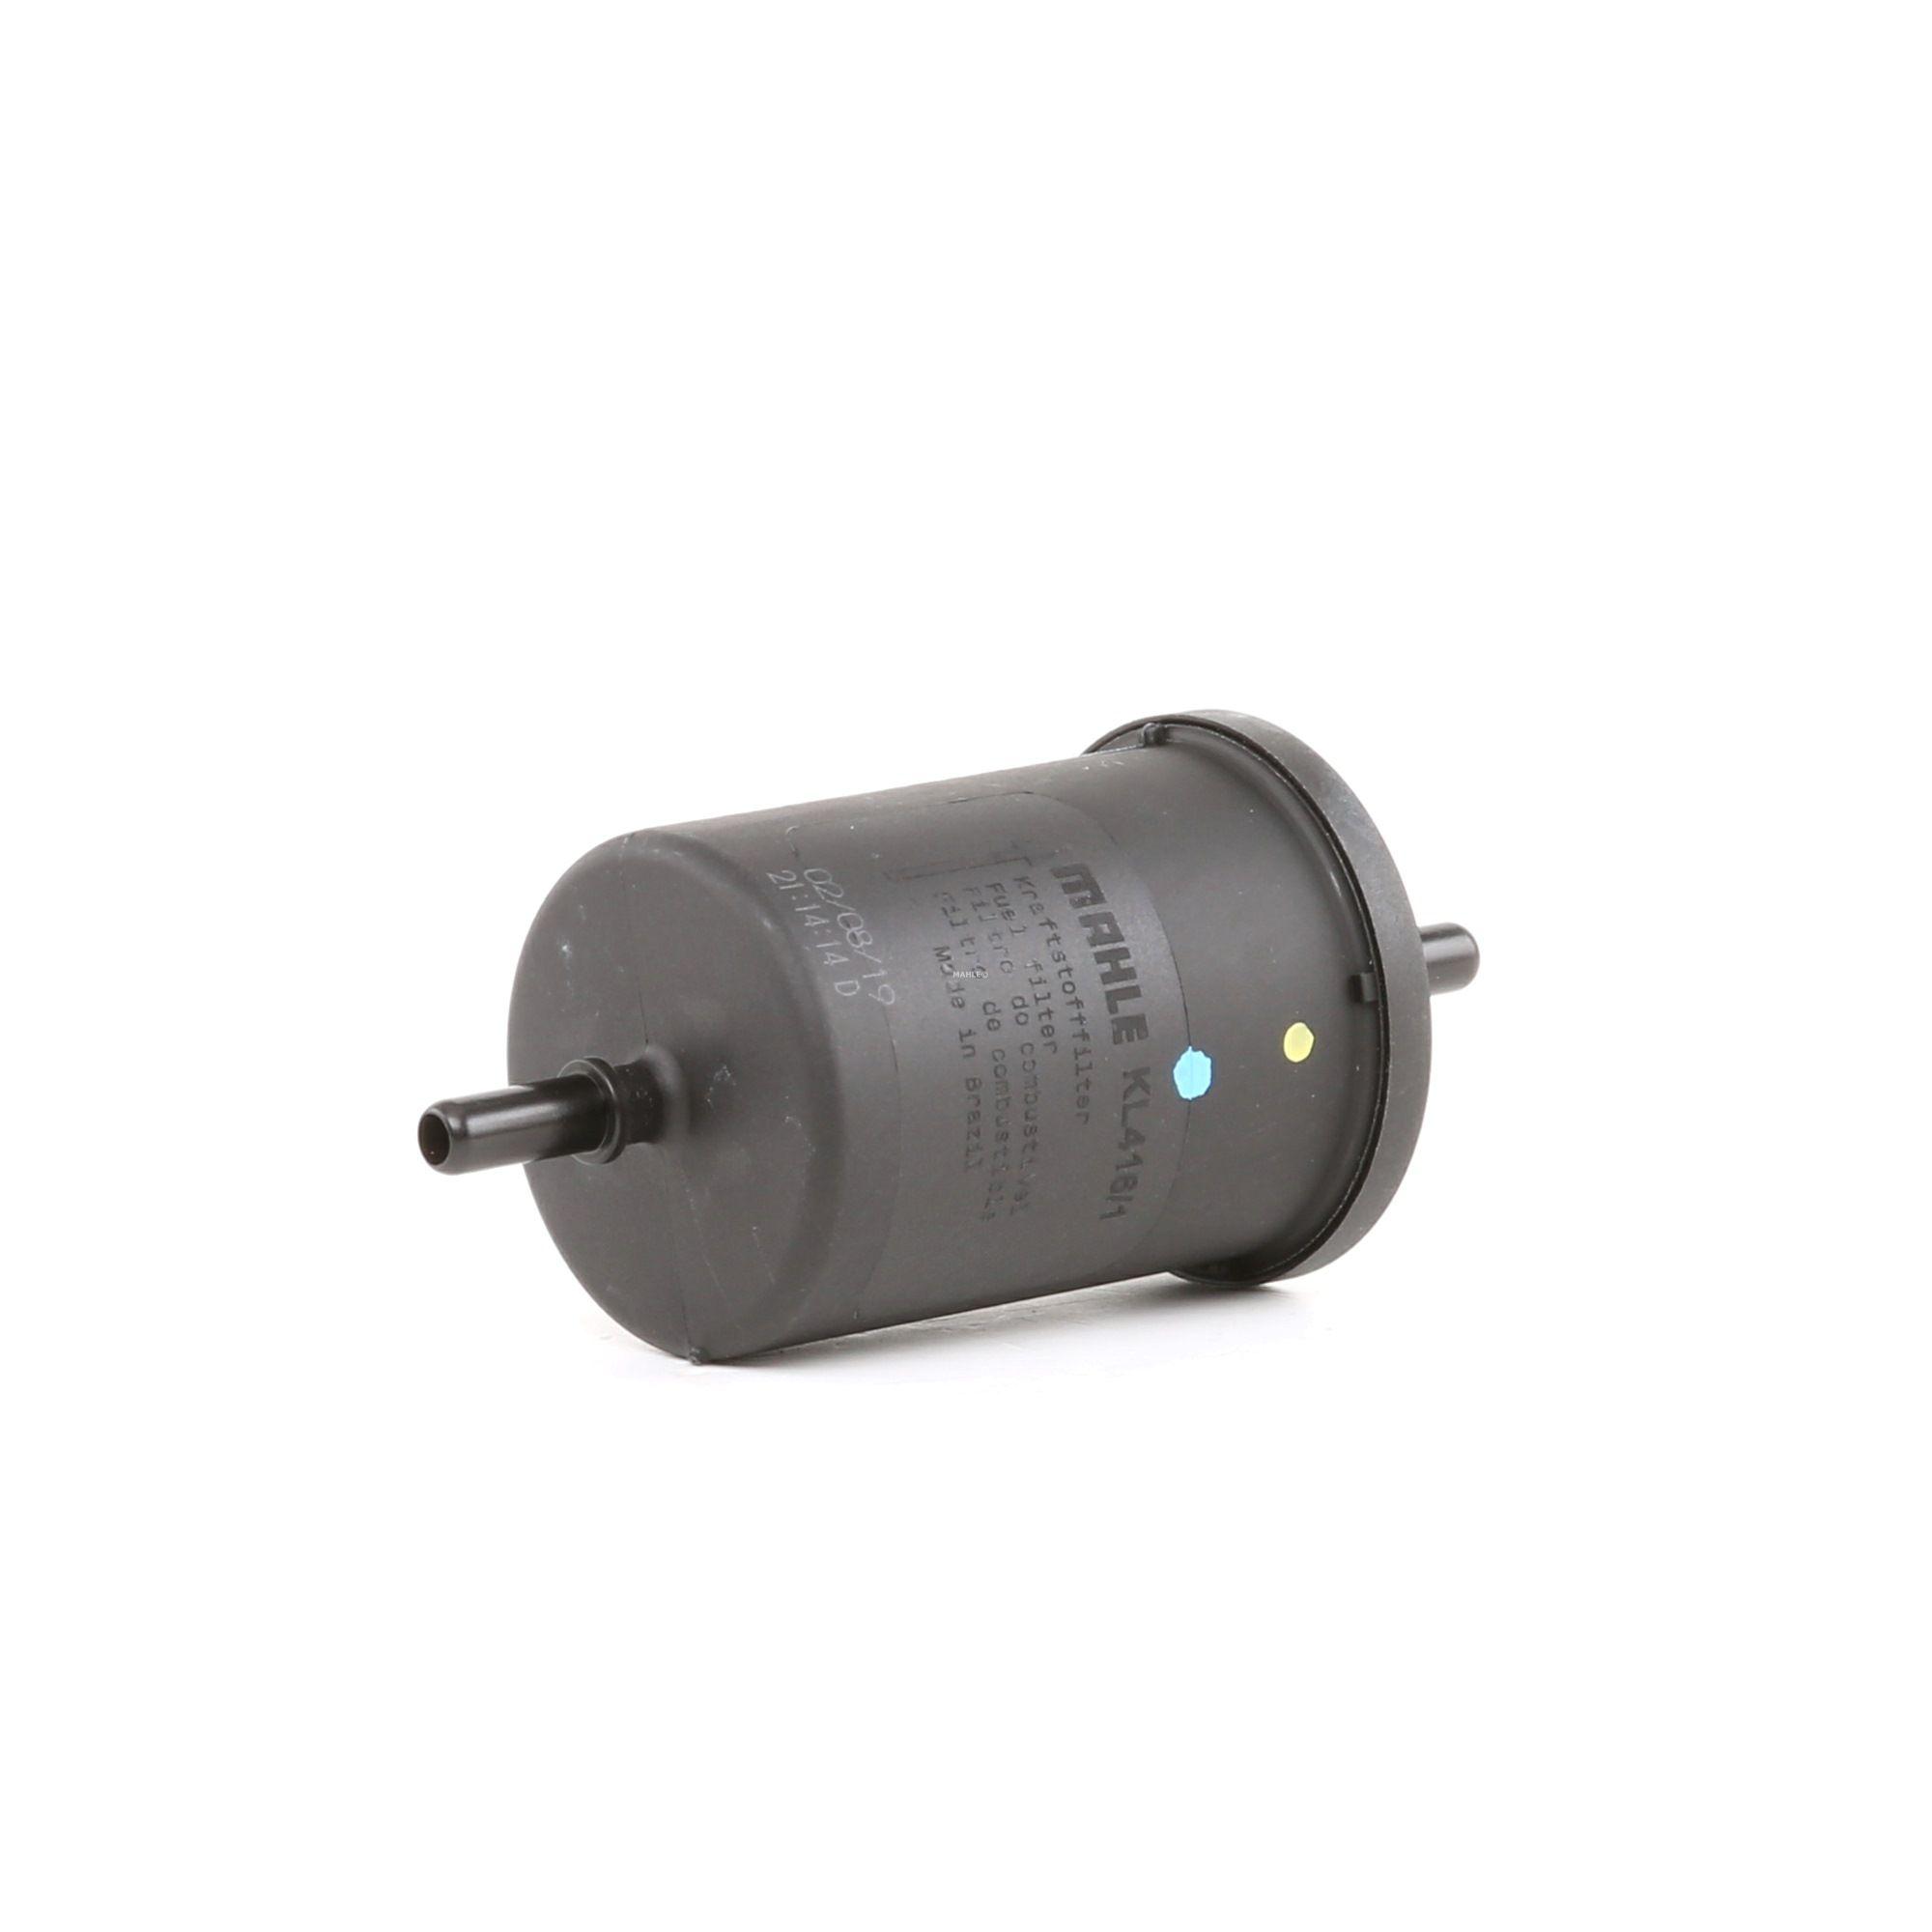 MAHLE ORIGINAL: Original Dieselfilter KL 416/1 (Höhe: 142mm, Gehäusedurchmesser: 55mm)